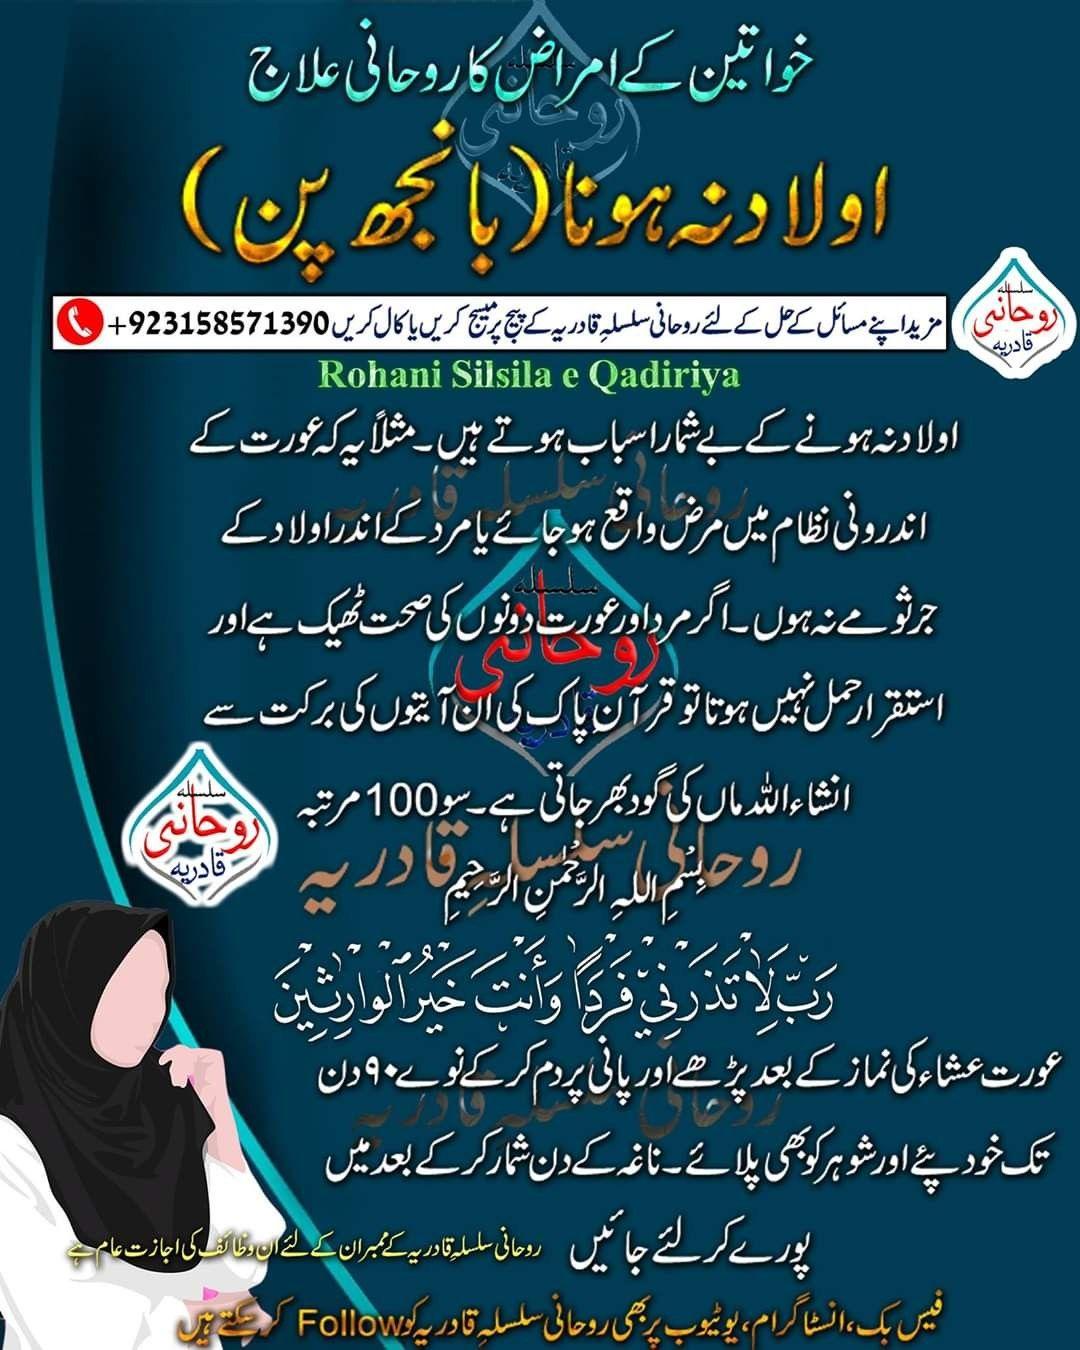 Banjh Pan Ka Ilaj , Wazifa بانجھ پن کا روحانی علاج ، وظیفہ